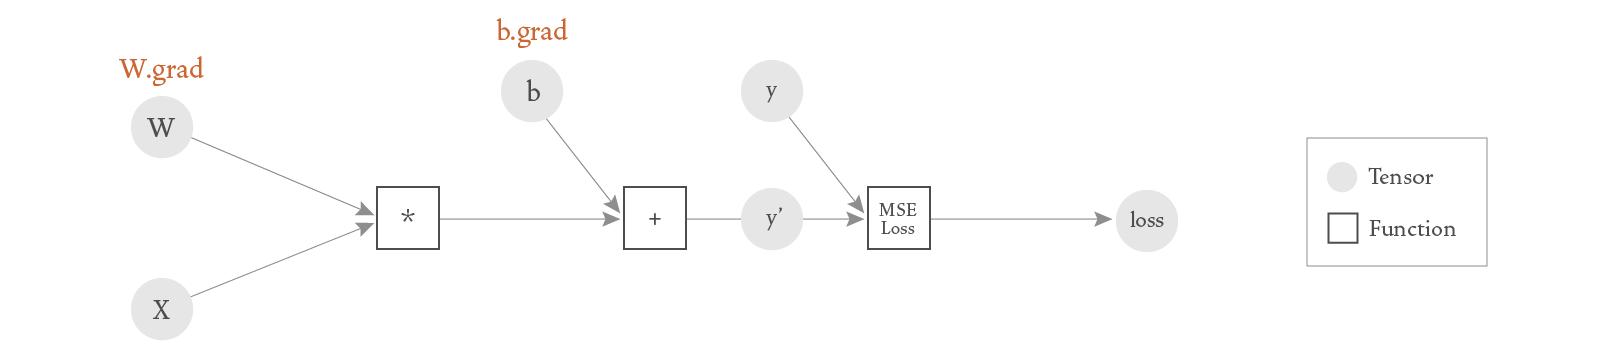 DAG corresponding to a basic neural network.